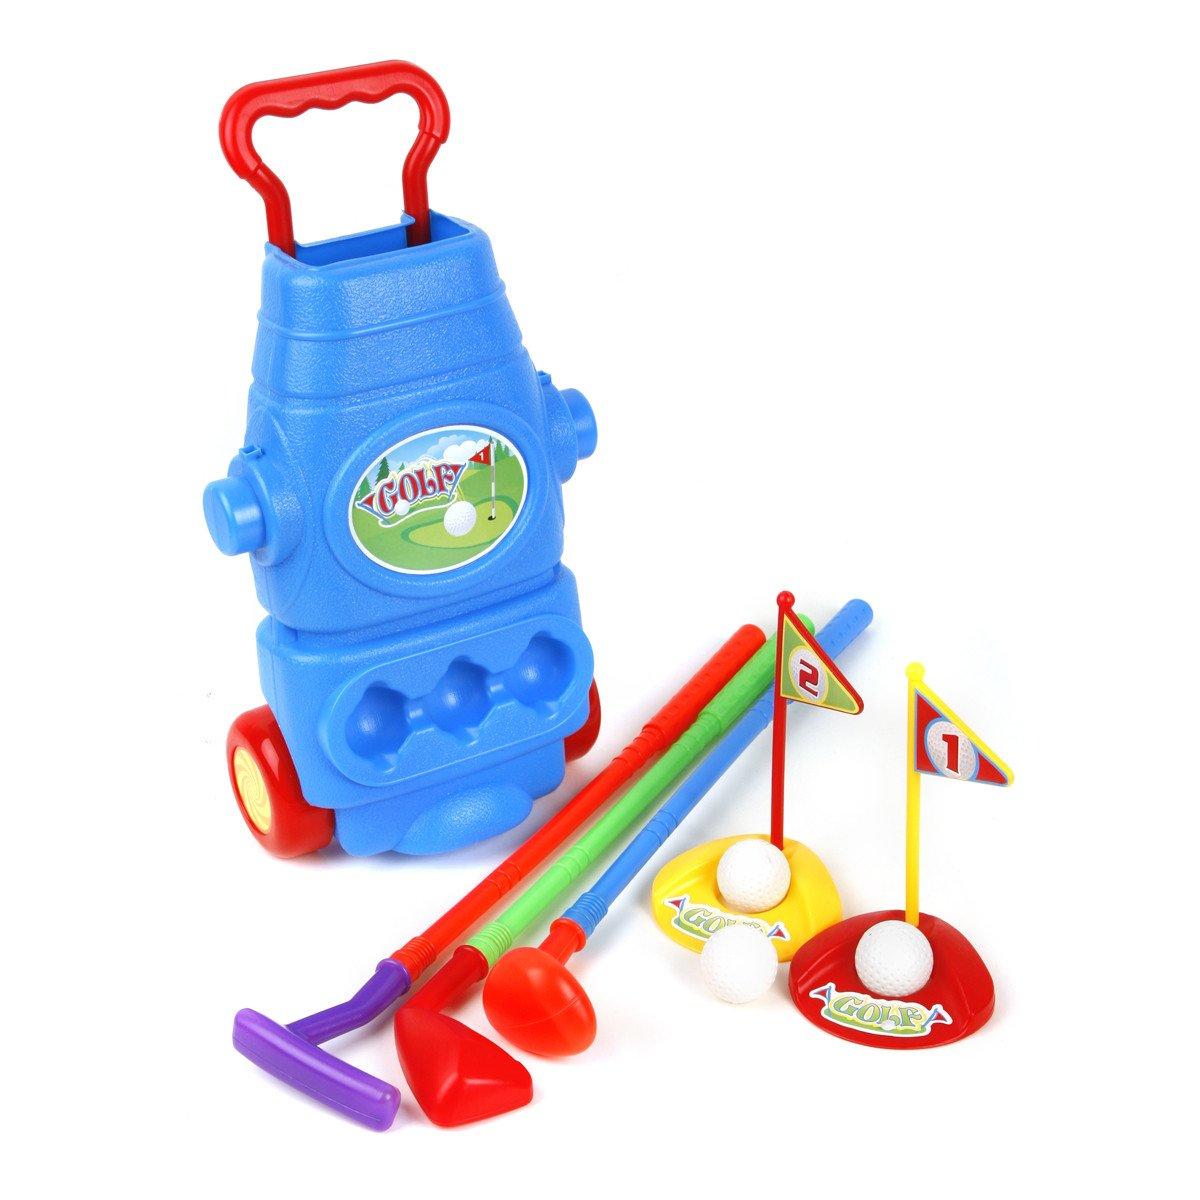 Ojam Swing 'N Play Kids Toy Golf Set (9) (9 Piece) by Ojam (Image #1)